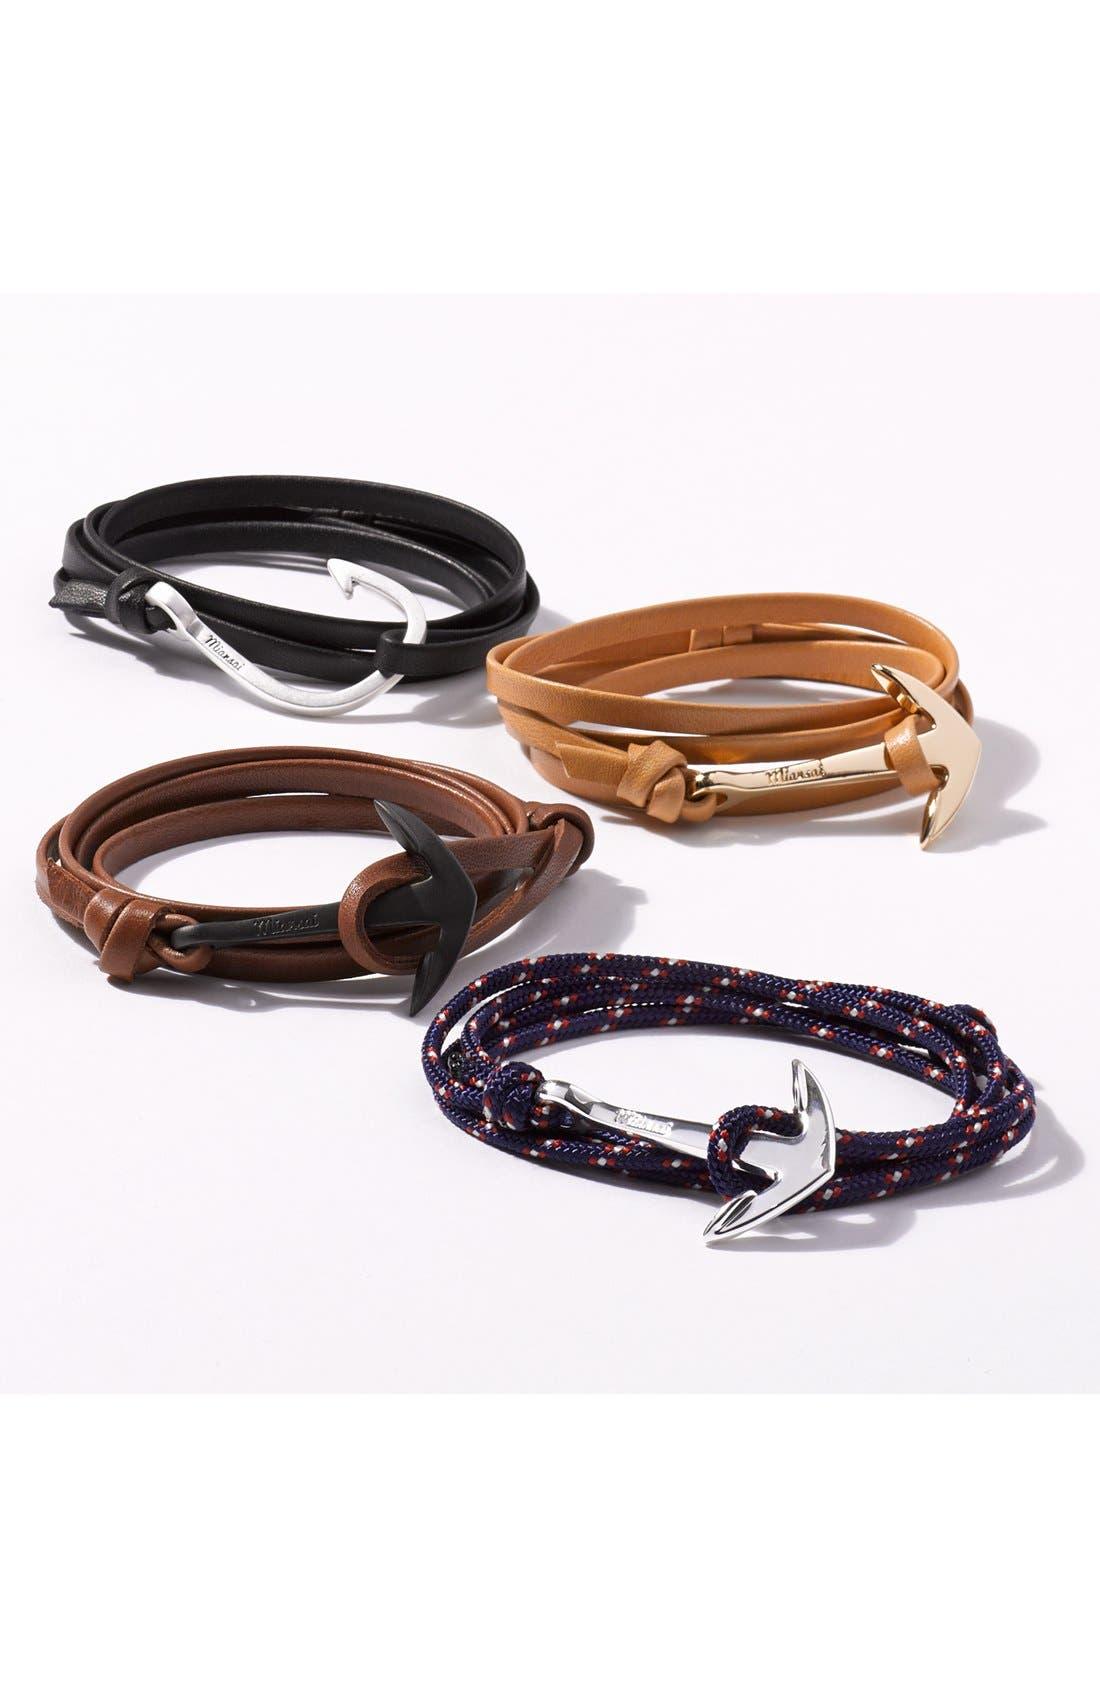 Silver Hook Leather Bracelet,                             Alternate thumbnail 4, color,